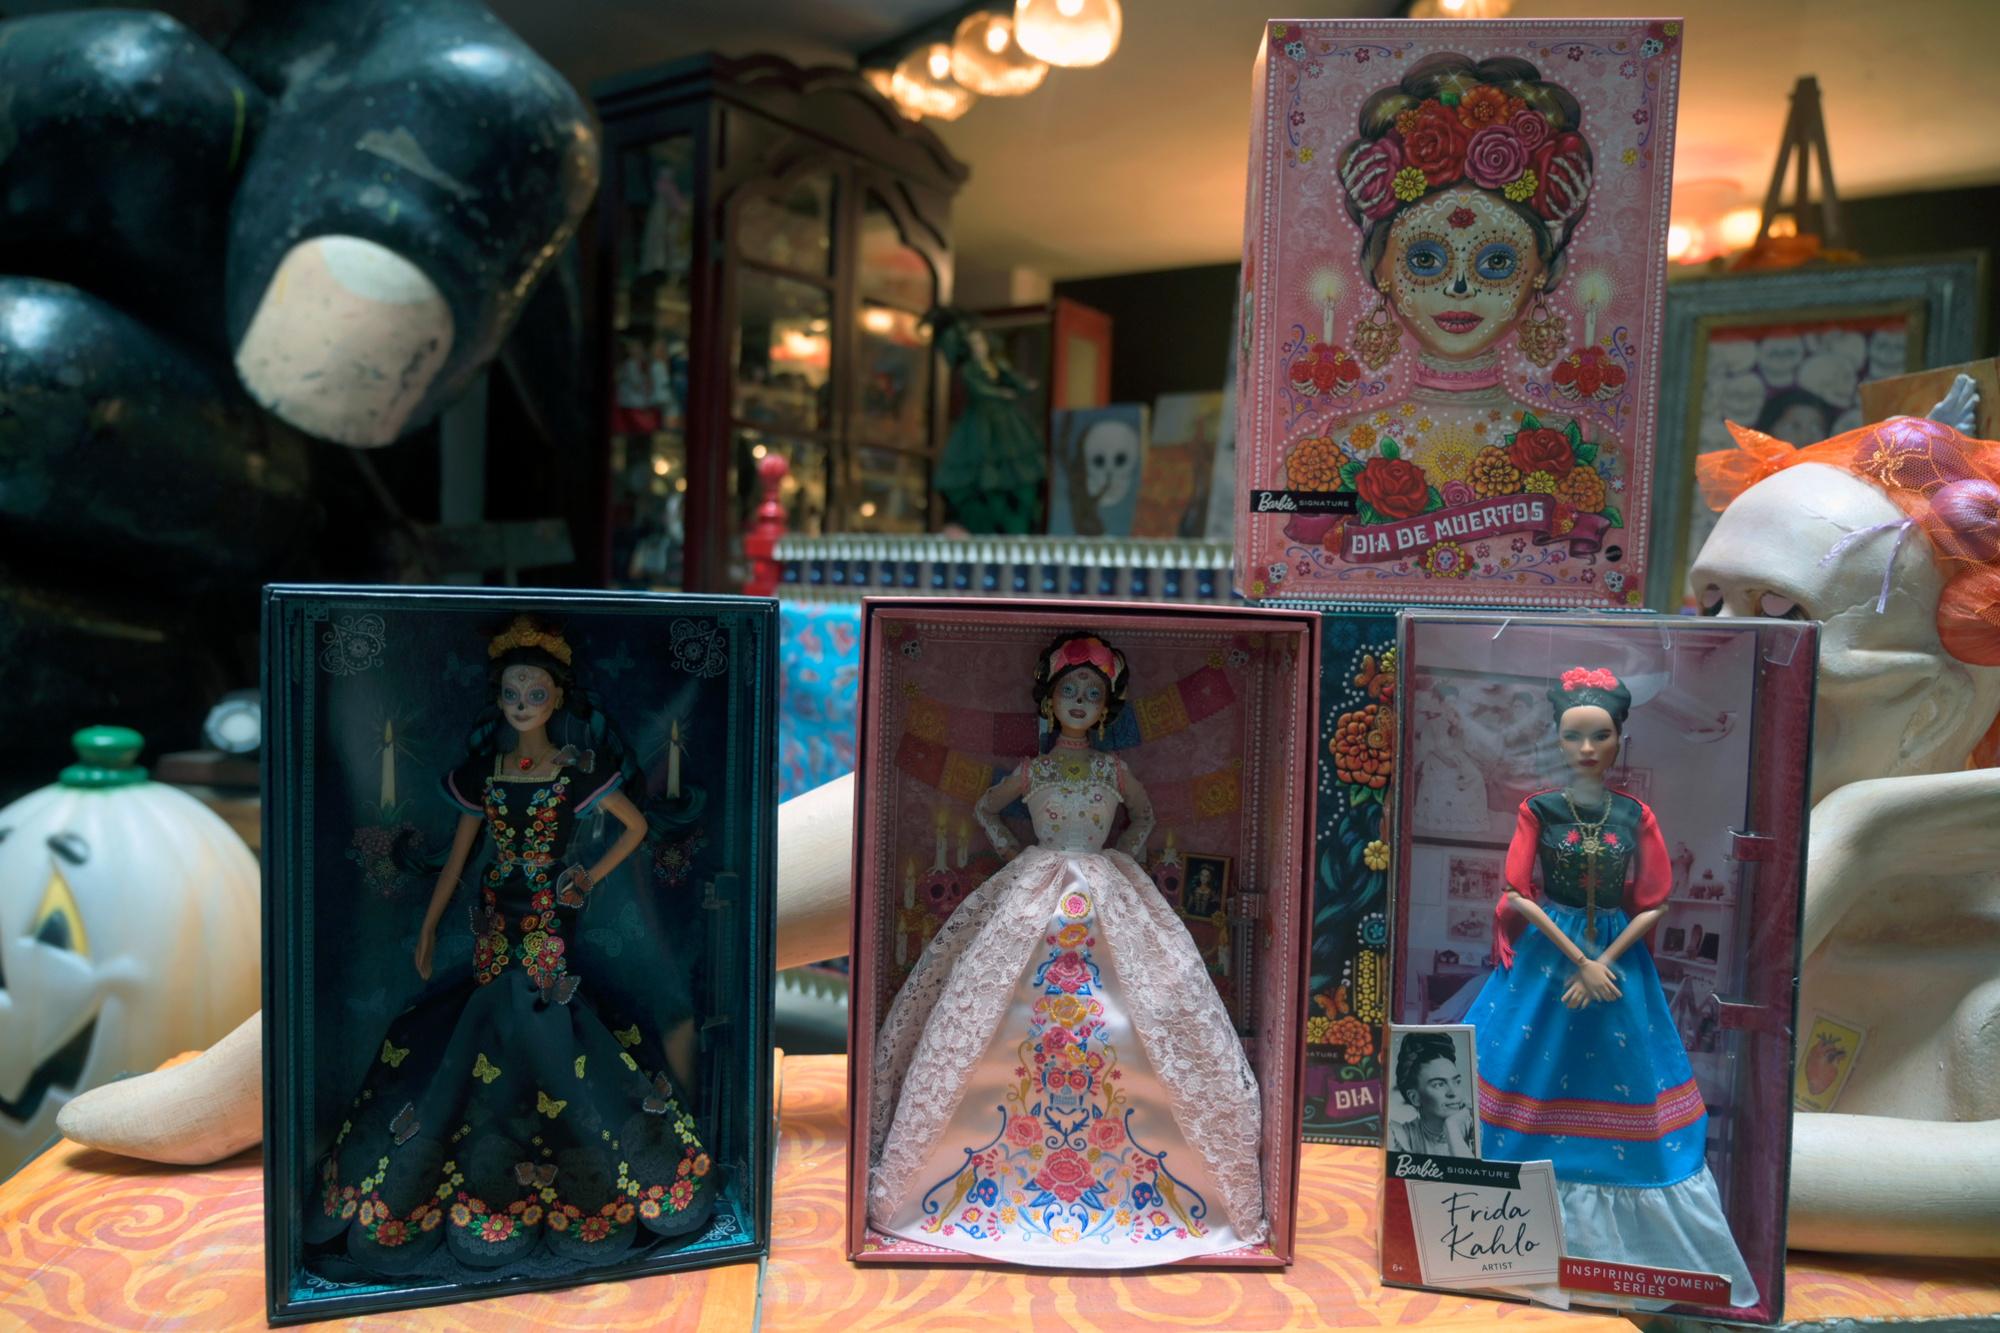 Deux Barbie Catrina et une Frida Kahlo, ALFREDO ESTRELLA / AFP